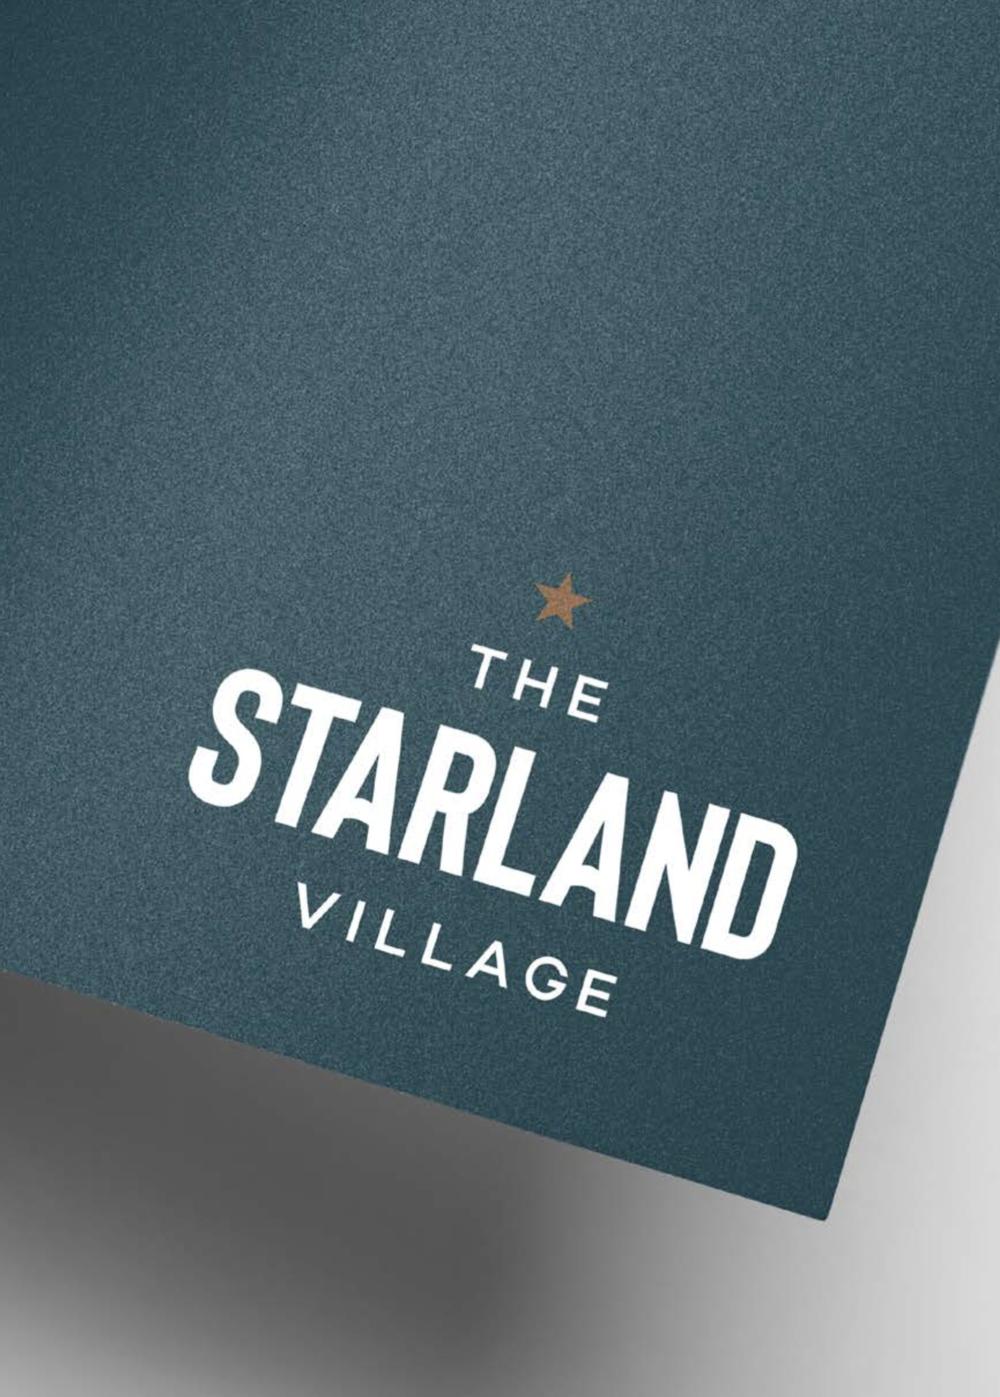 Flourish-Collaborative-Branding-Agency-Savannah-The-Starland-Village-Development-Logo3.png